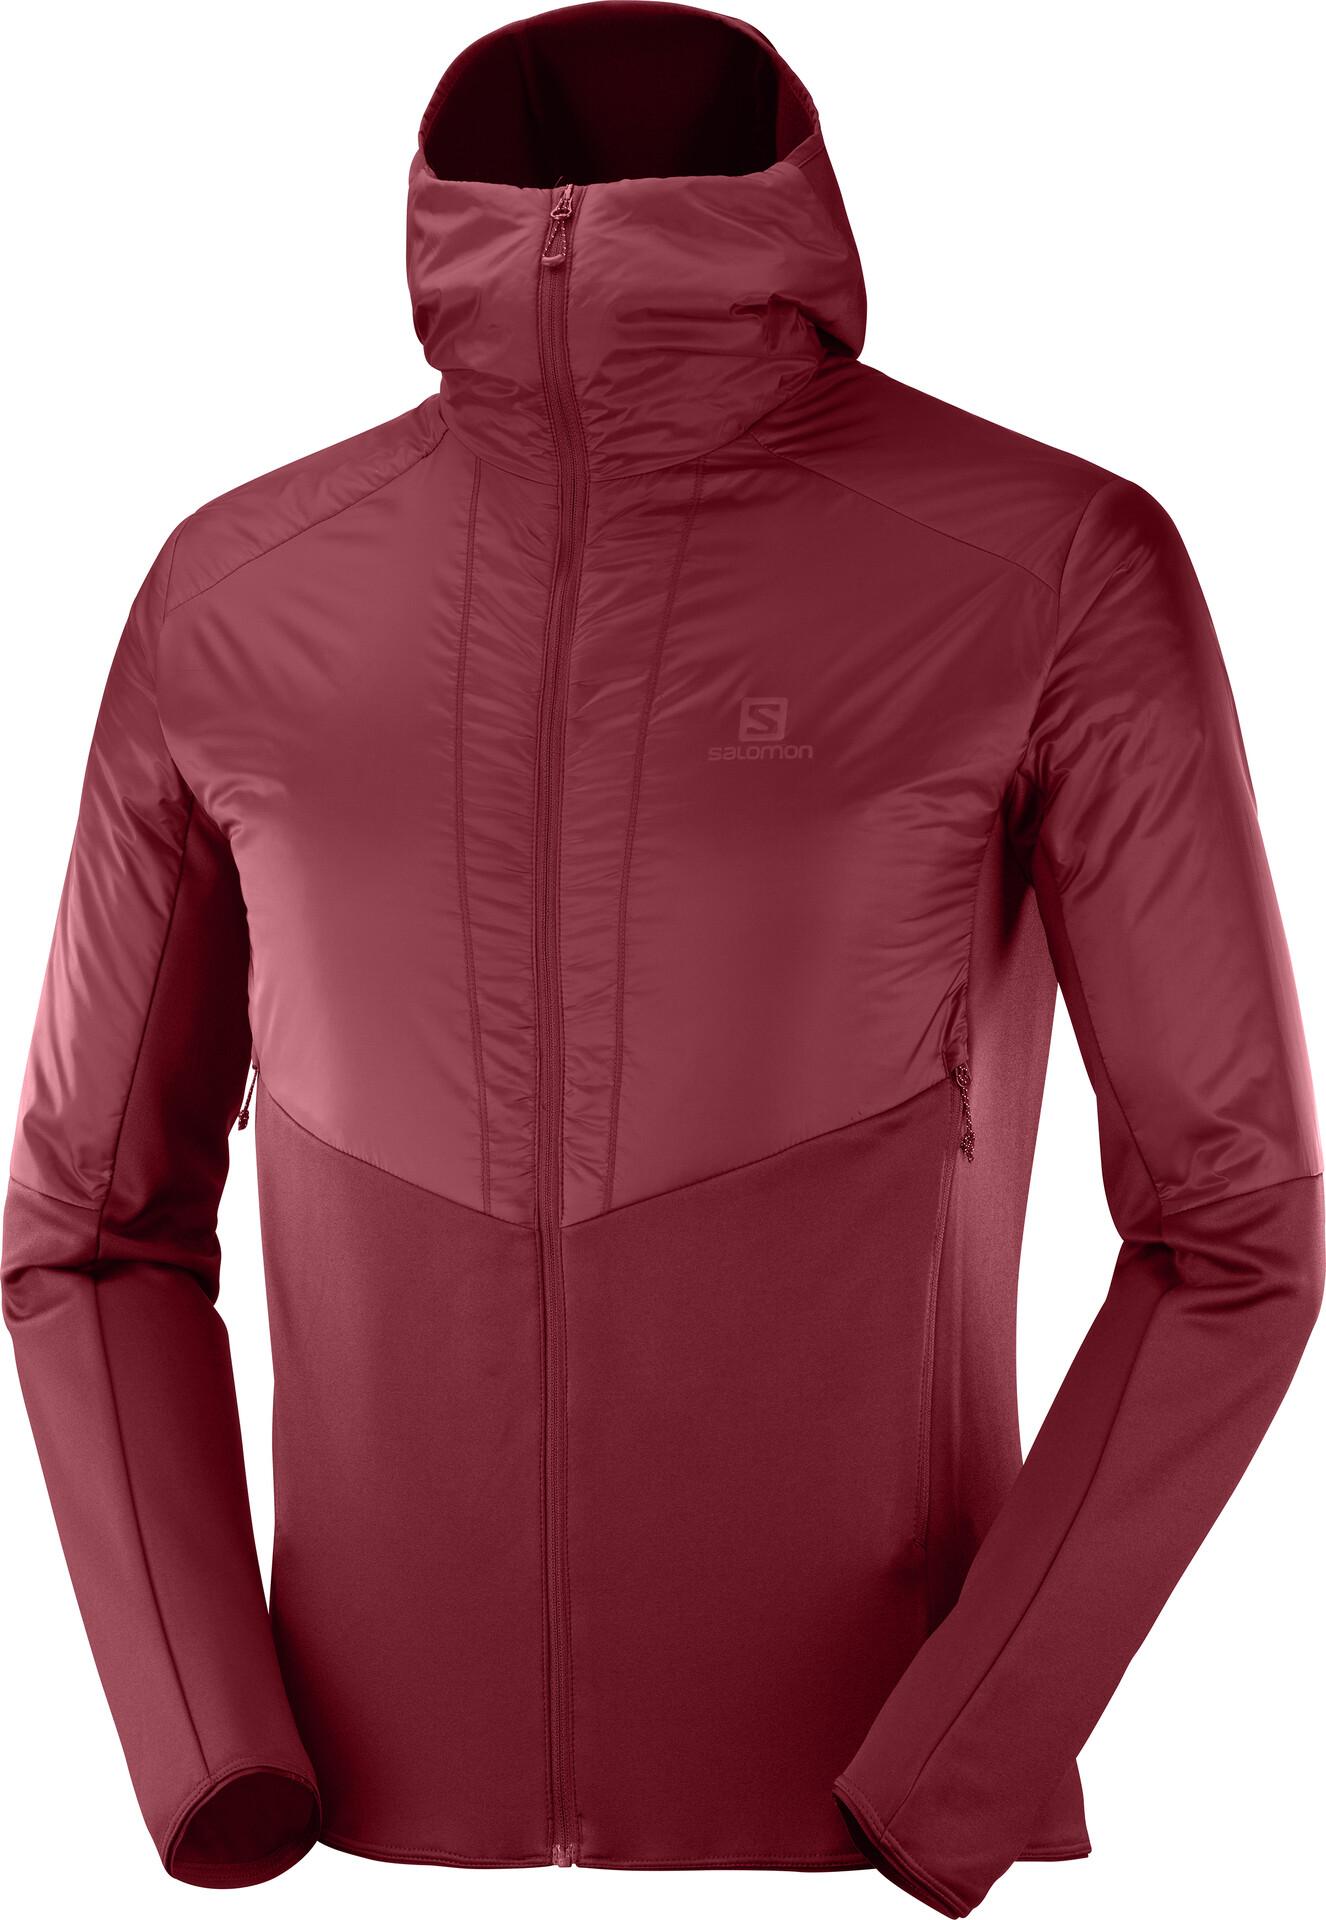 Salomon Outline Warm Jacket Men biking re